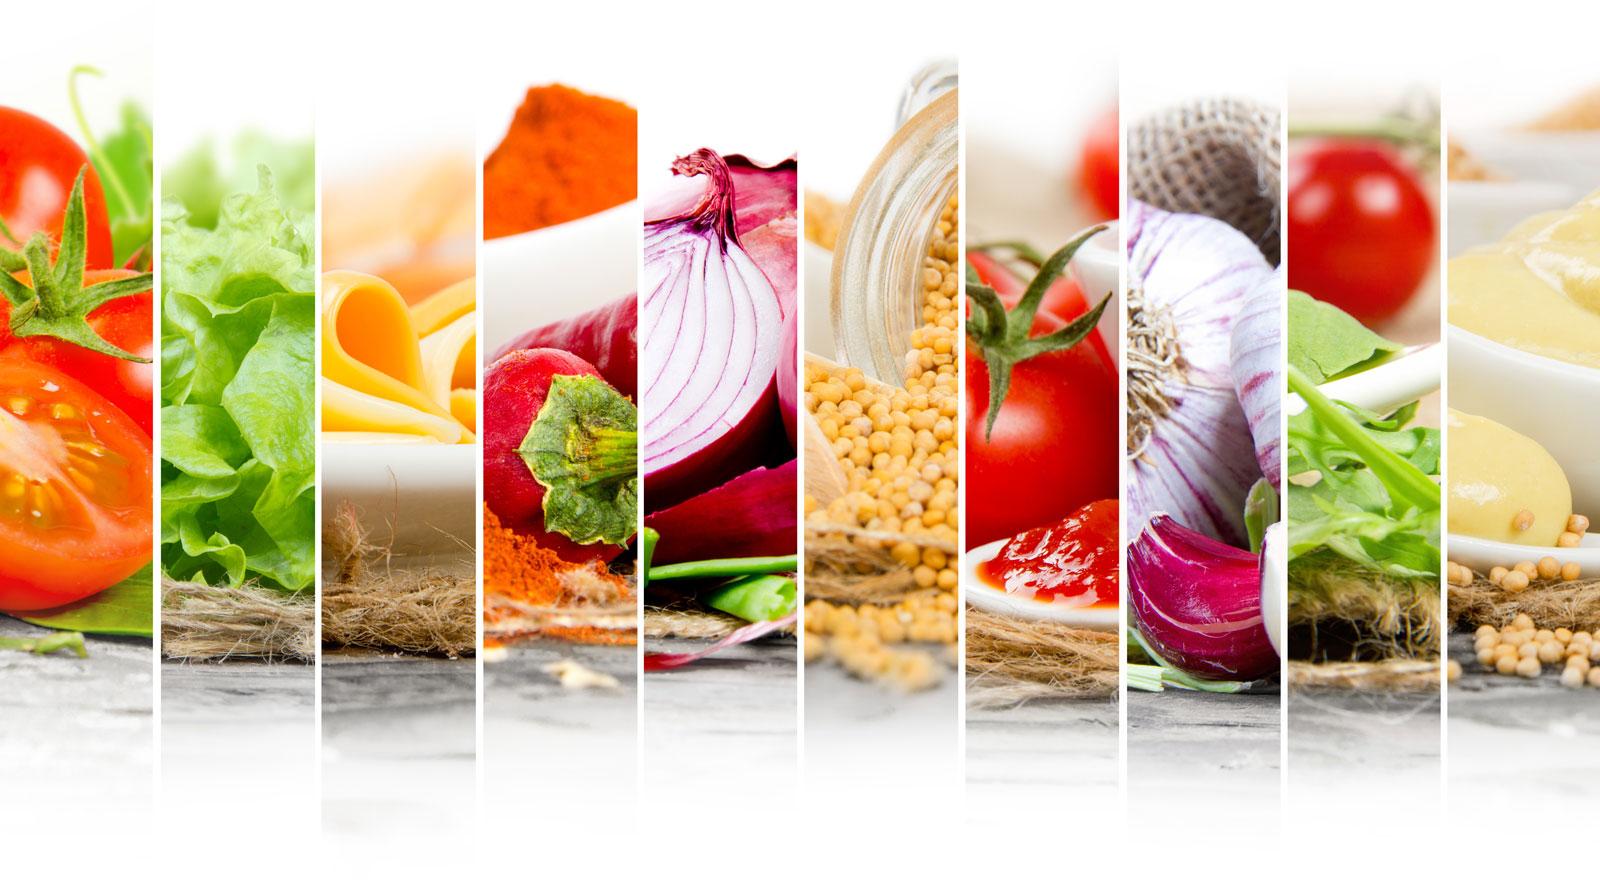 Food-Labeling-Compliance-A-Roadmap